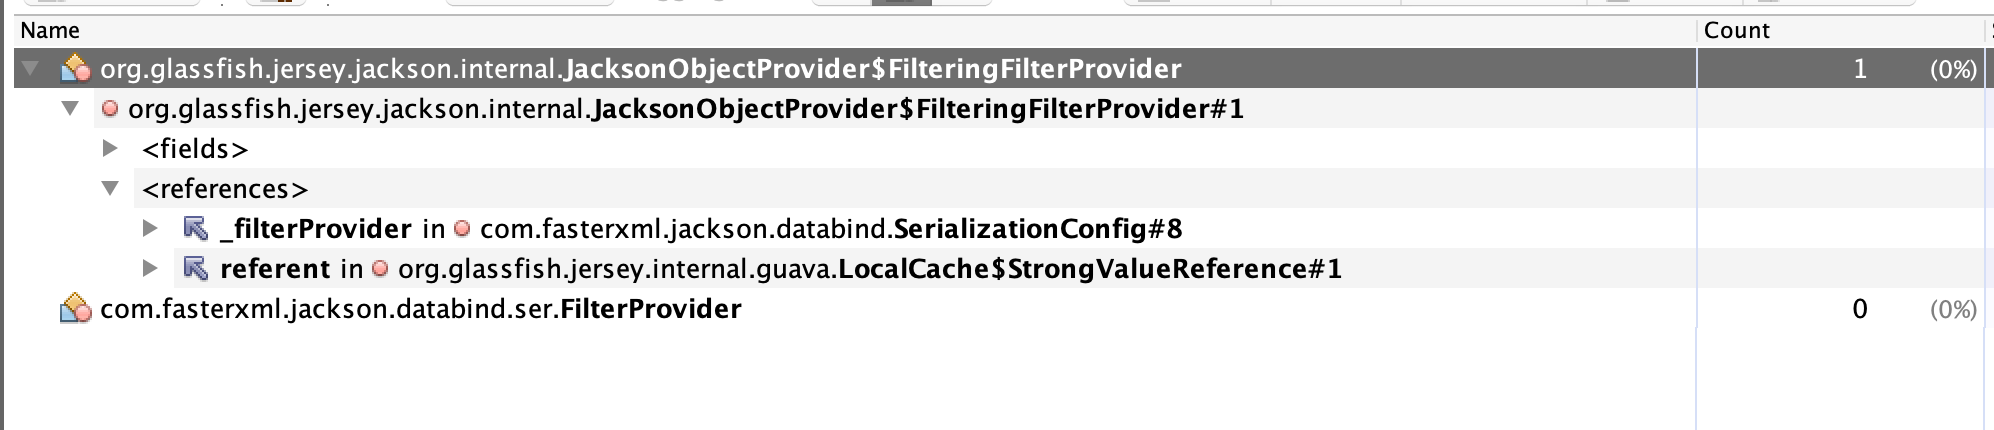 SerializerProvider has no FilterProvider but retrieves a